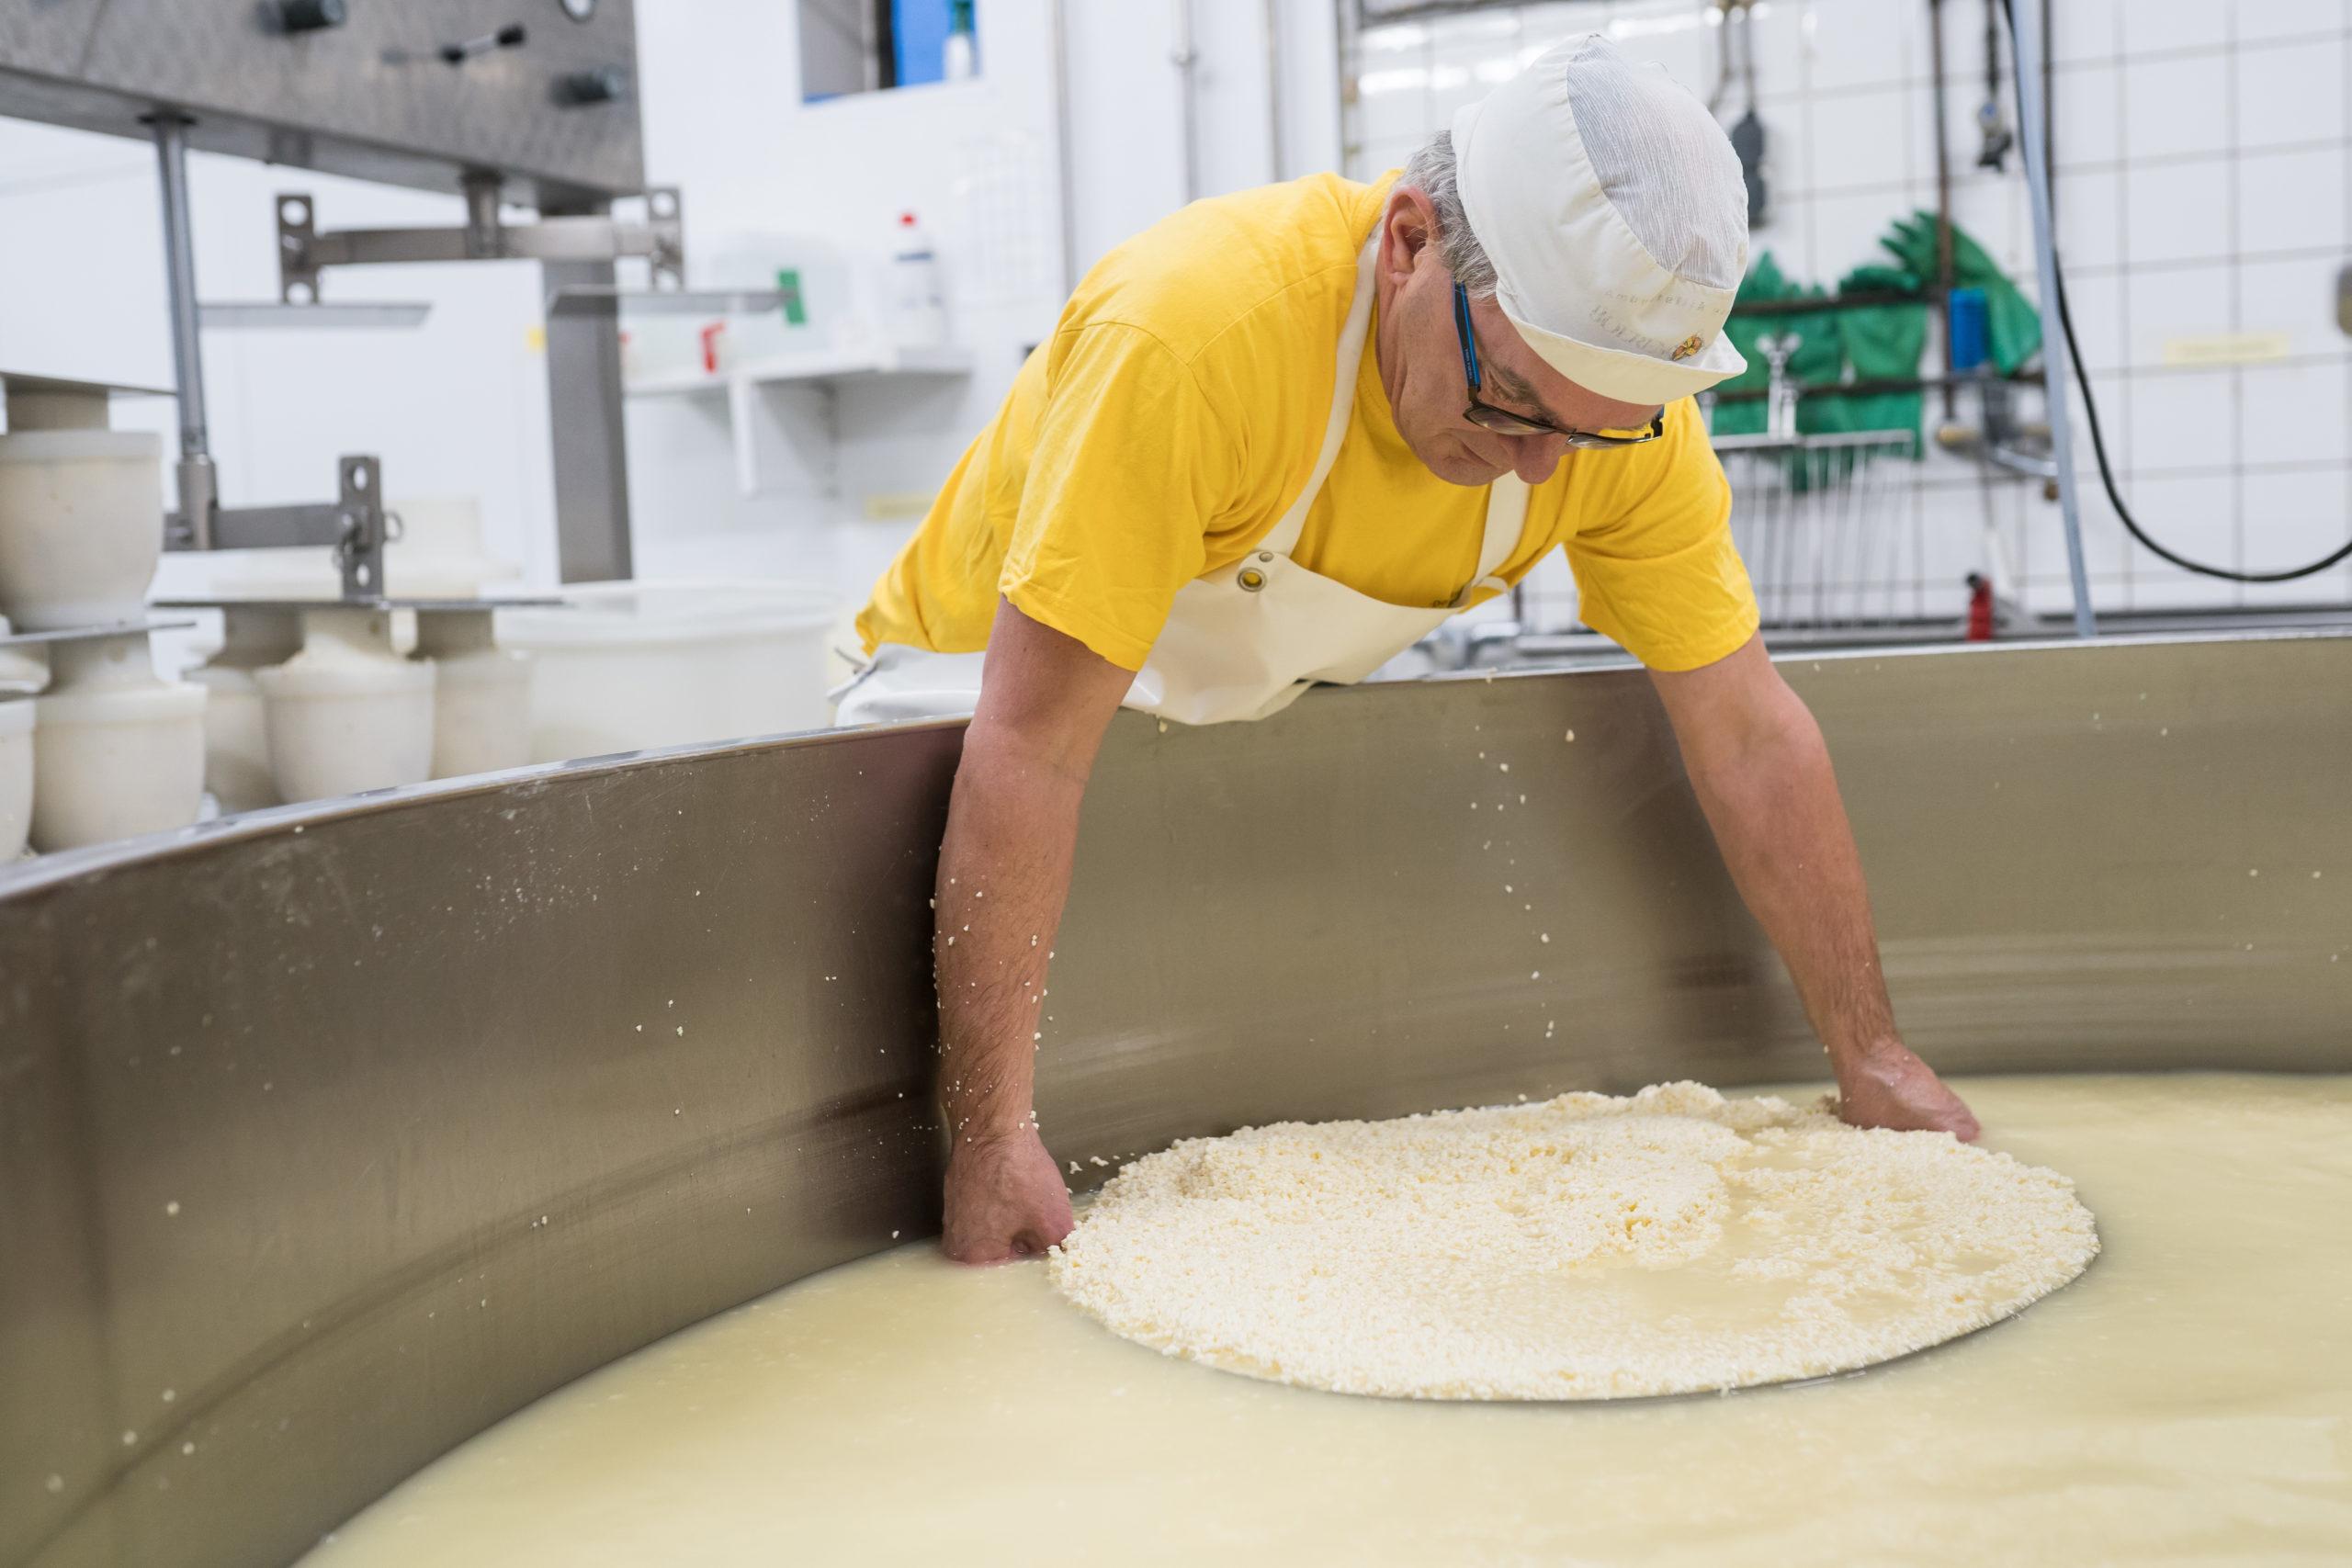 hoe maak je kaas?